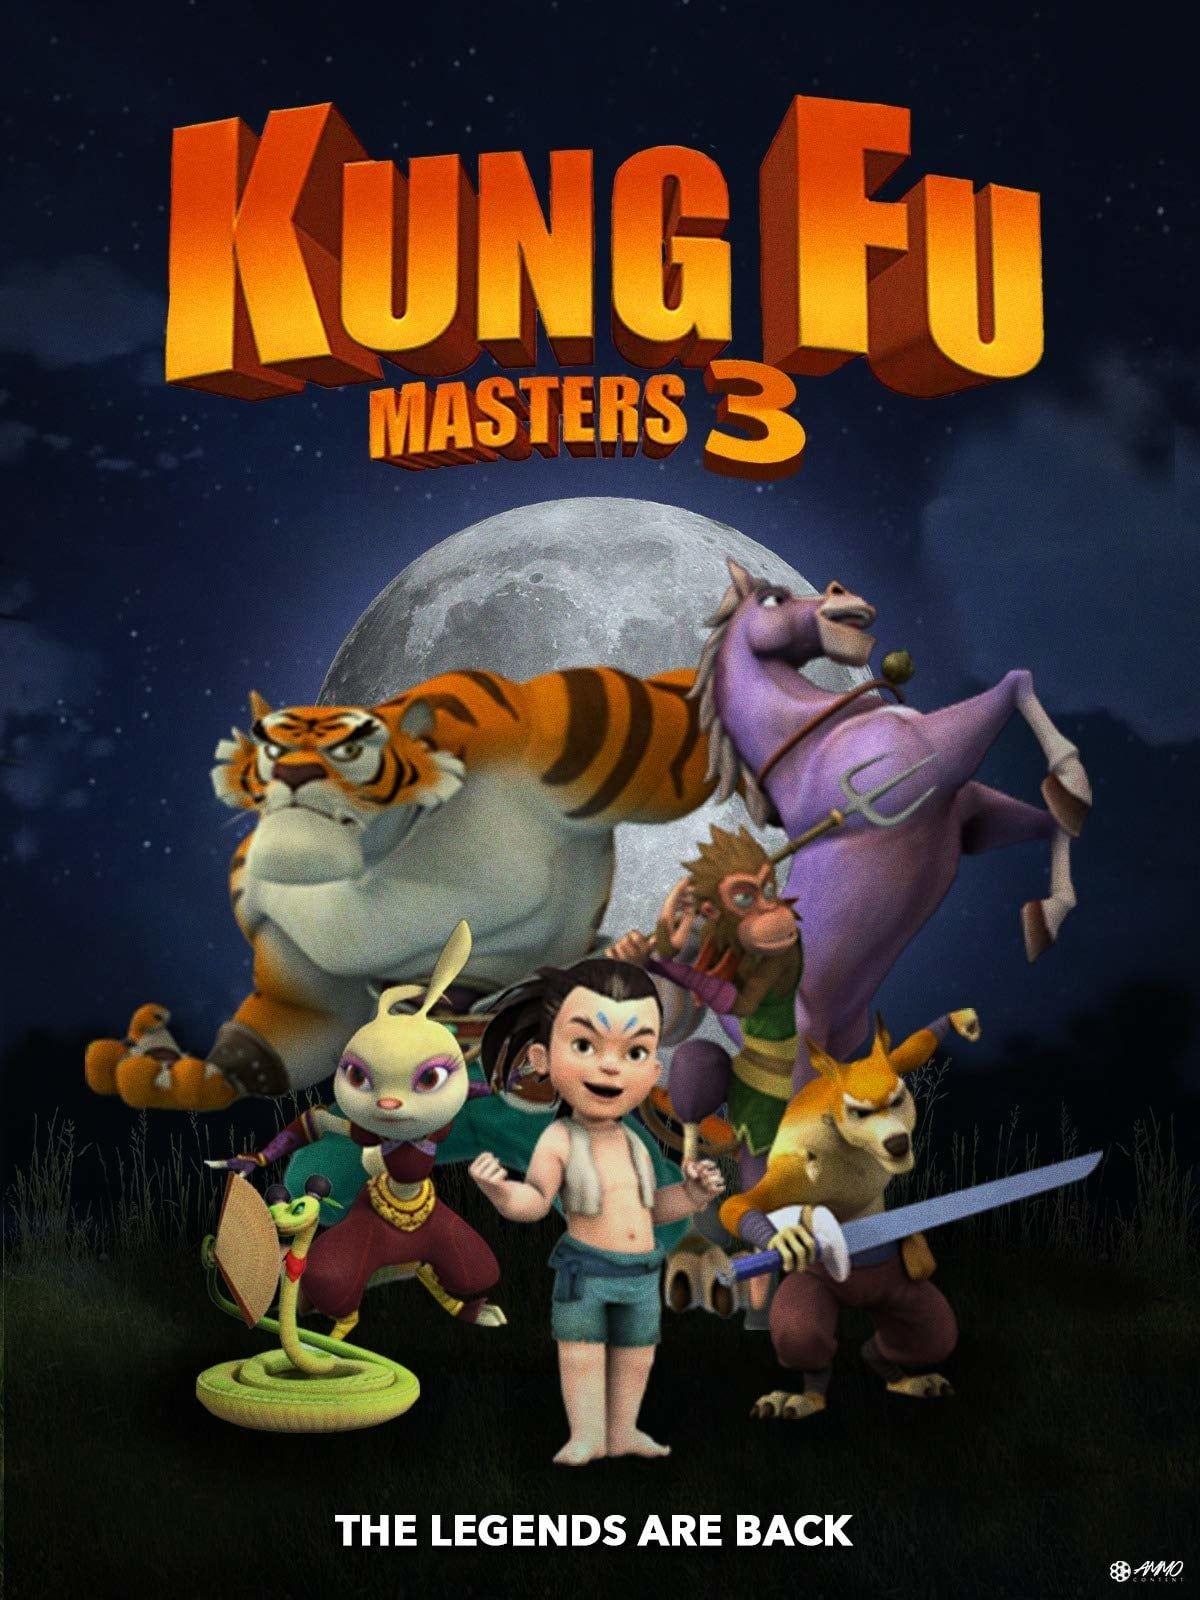 Nonton Movie Kung Fu Masters 3 Subtitle Indonesia